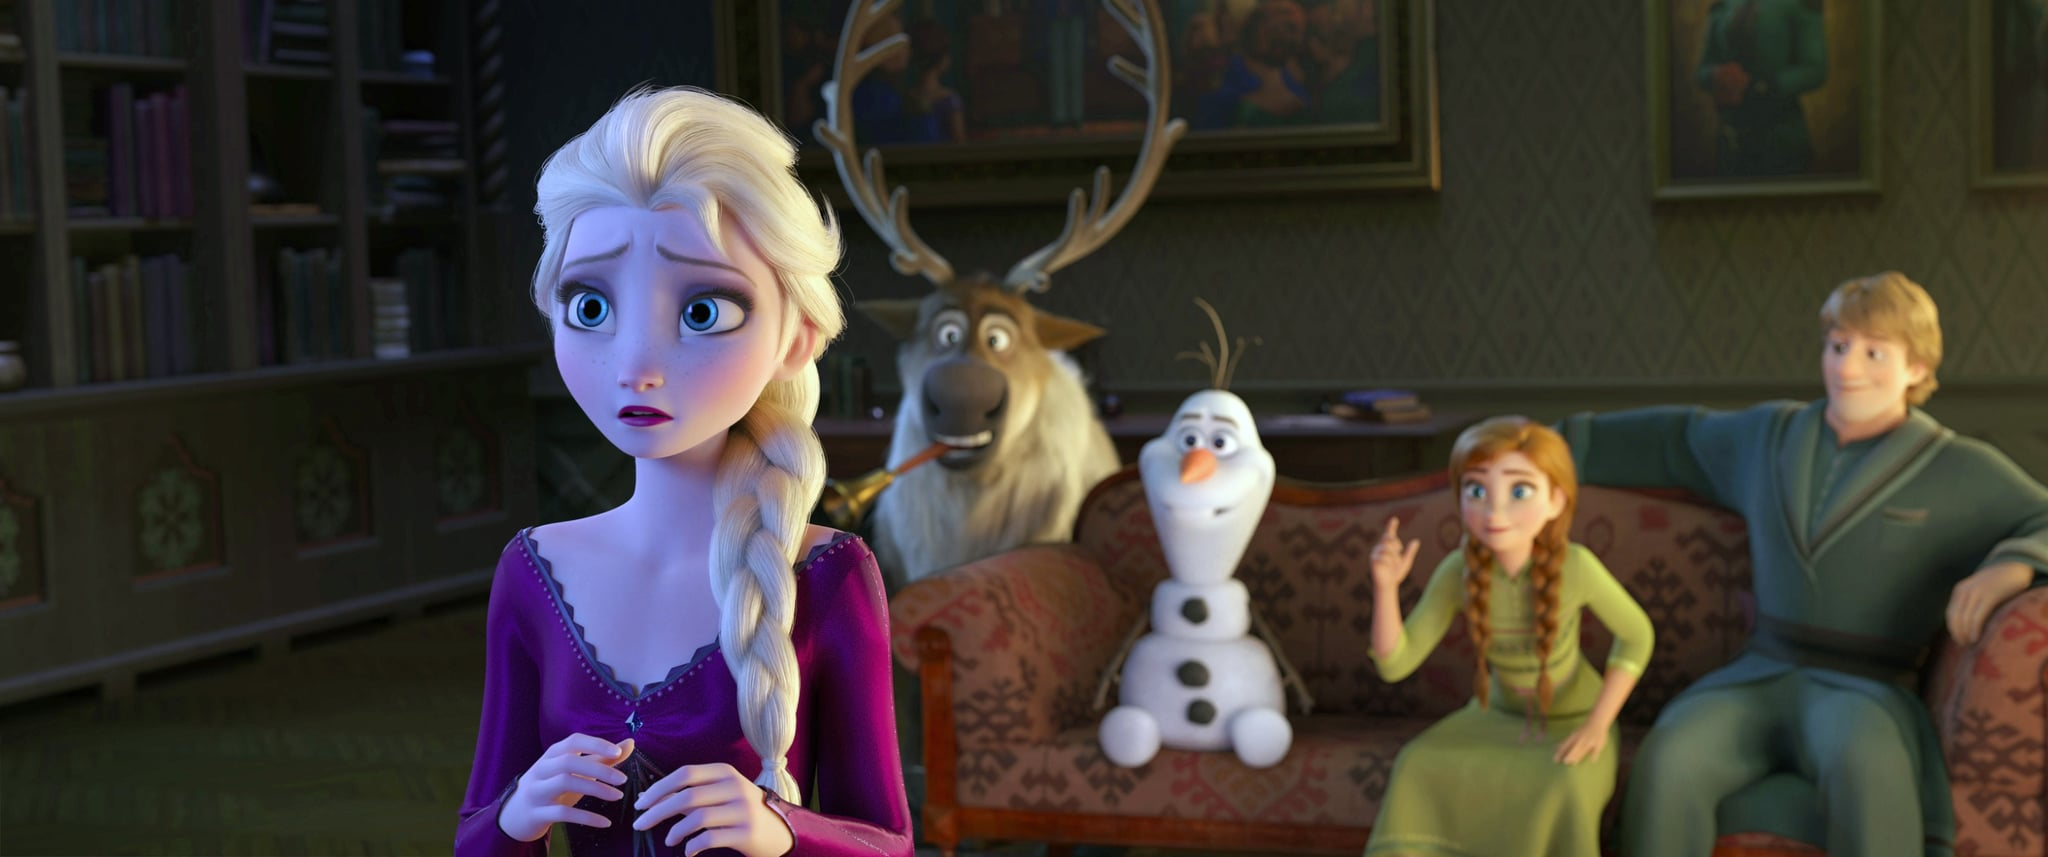 FROZEN II, (aka FROZEN 2), from left: Elsa (voice: Idina Menzel), Sven, Olaf (voice: Josh Gad), Anna (voice: Kristen Bell), Kristoff (voice: Jonathan Groff), 2019.  Walt Disney Studios Motion Pictures / courtesy Everett Collection